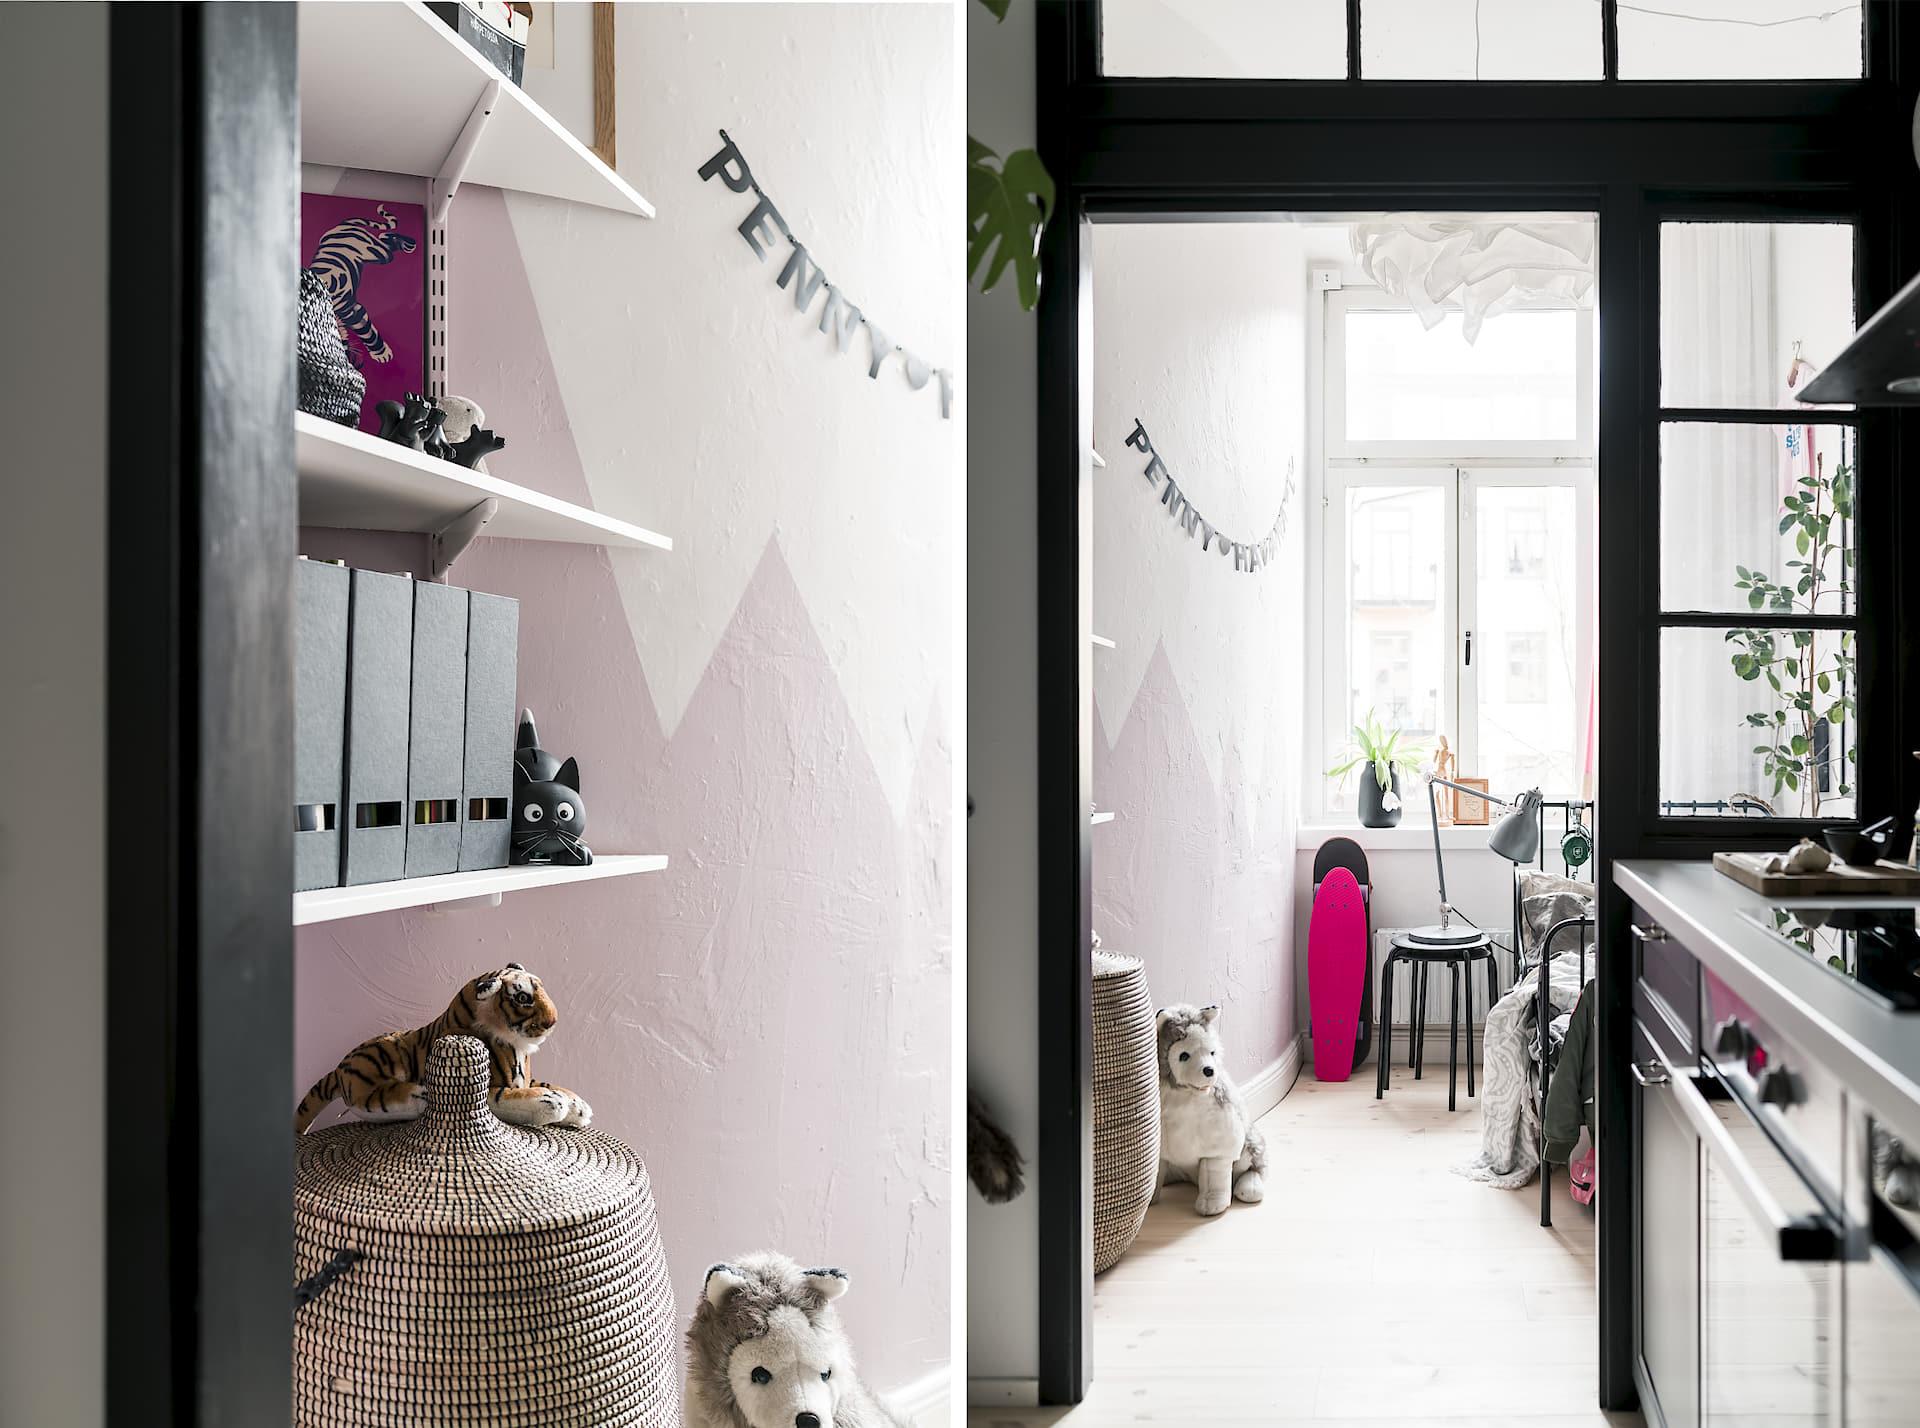 Interior peque o con aire industrial virlova style - Virlova style ...